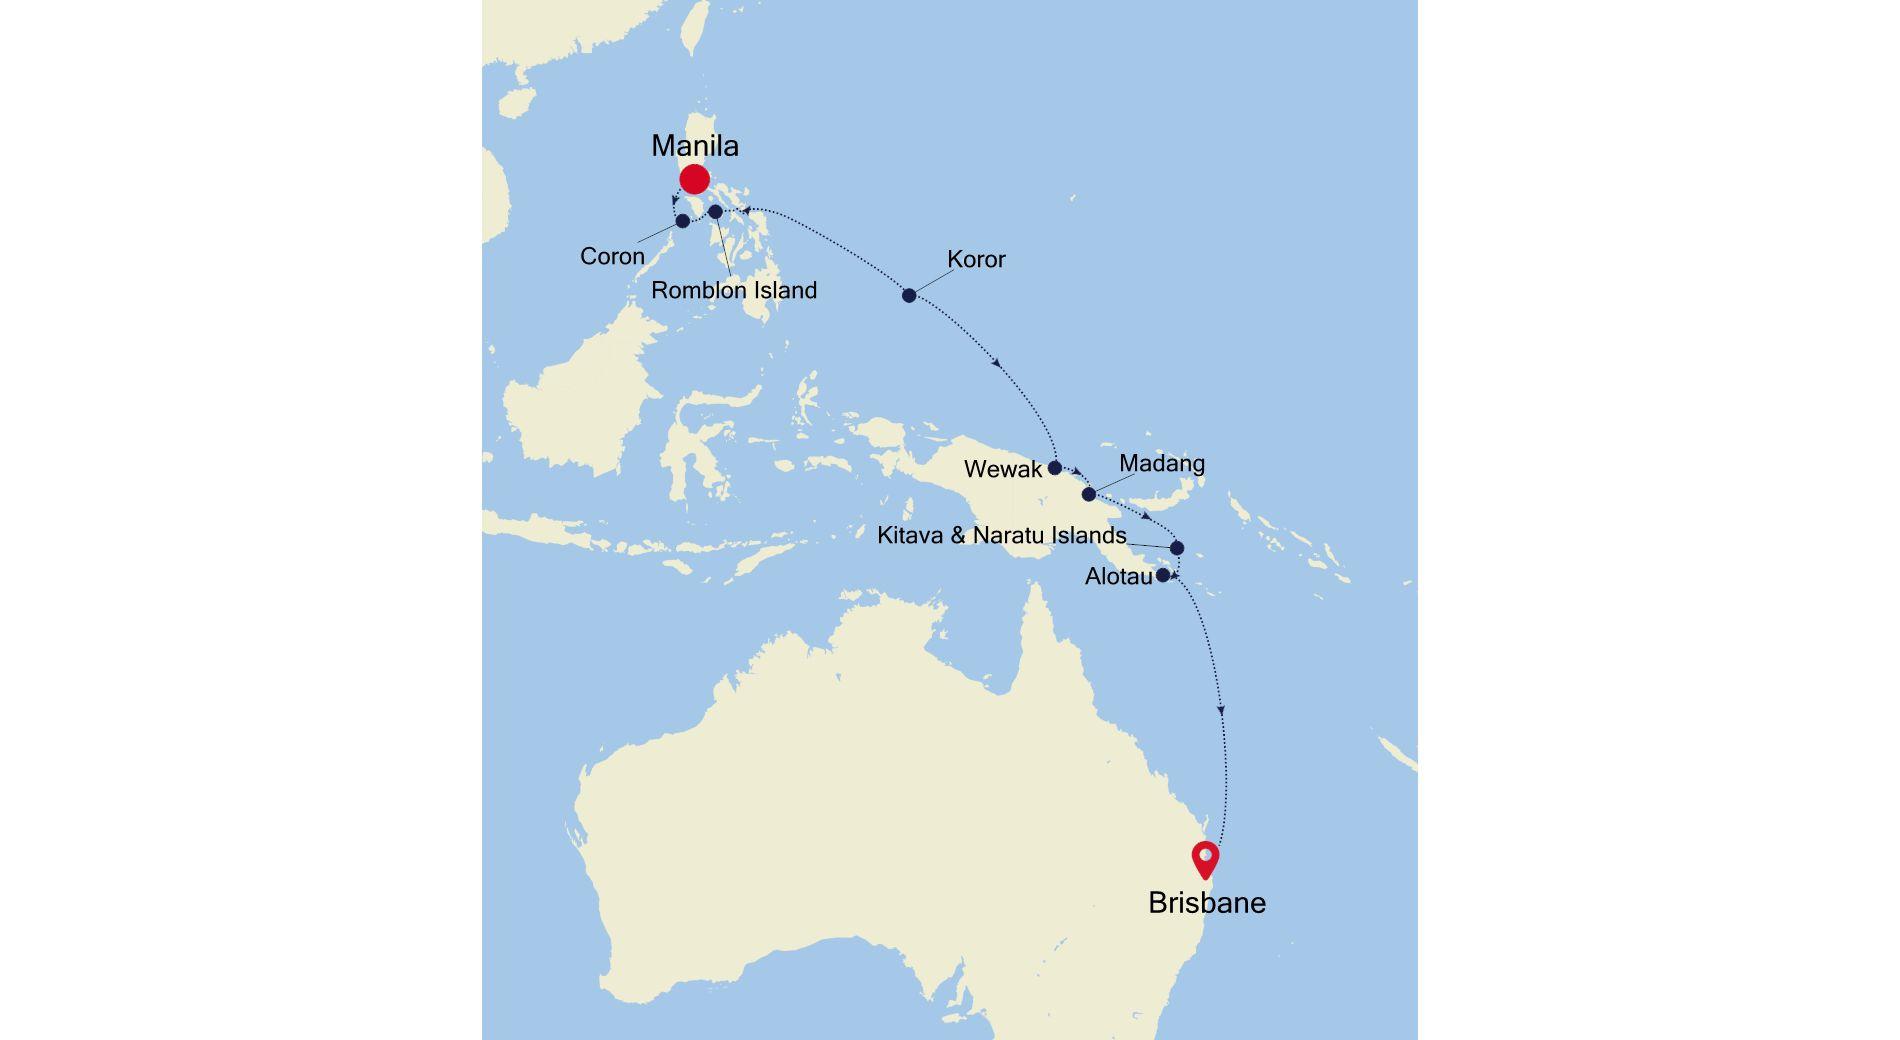 SM201013S16 - Manila to Brisbane